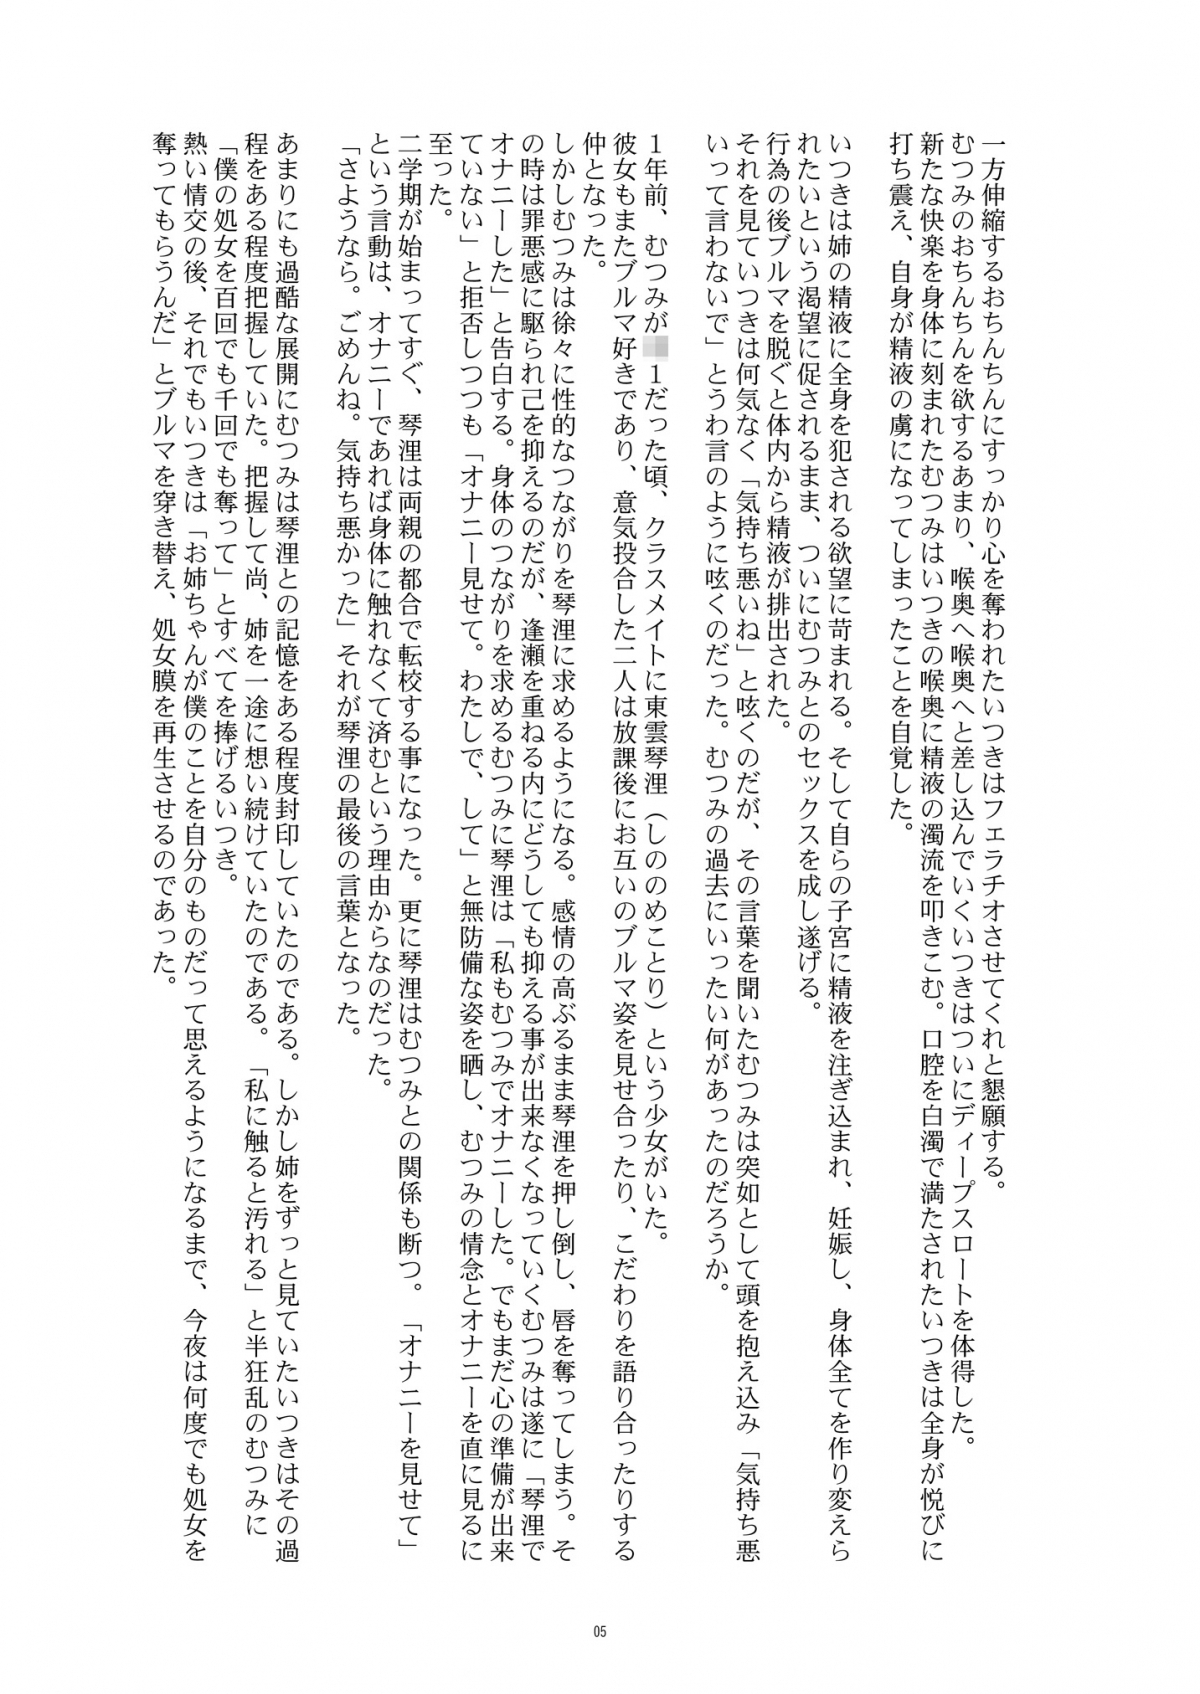 HentaiVN.net - Ảnh 6 - [Shota+Loli] Hentai Futago - Futago 12 - Chap 9